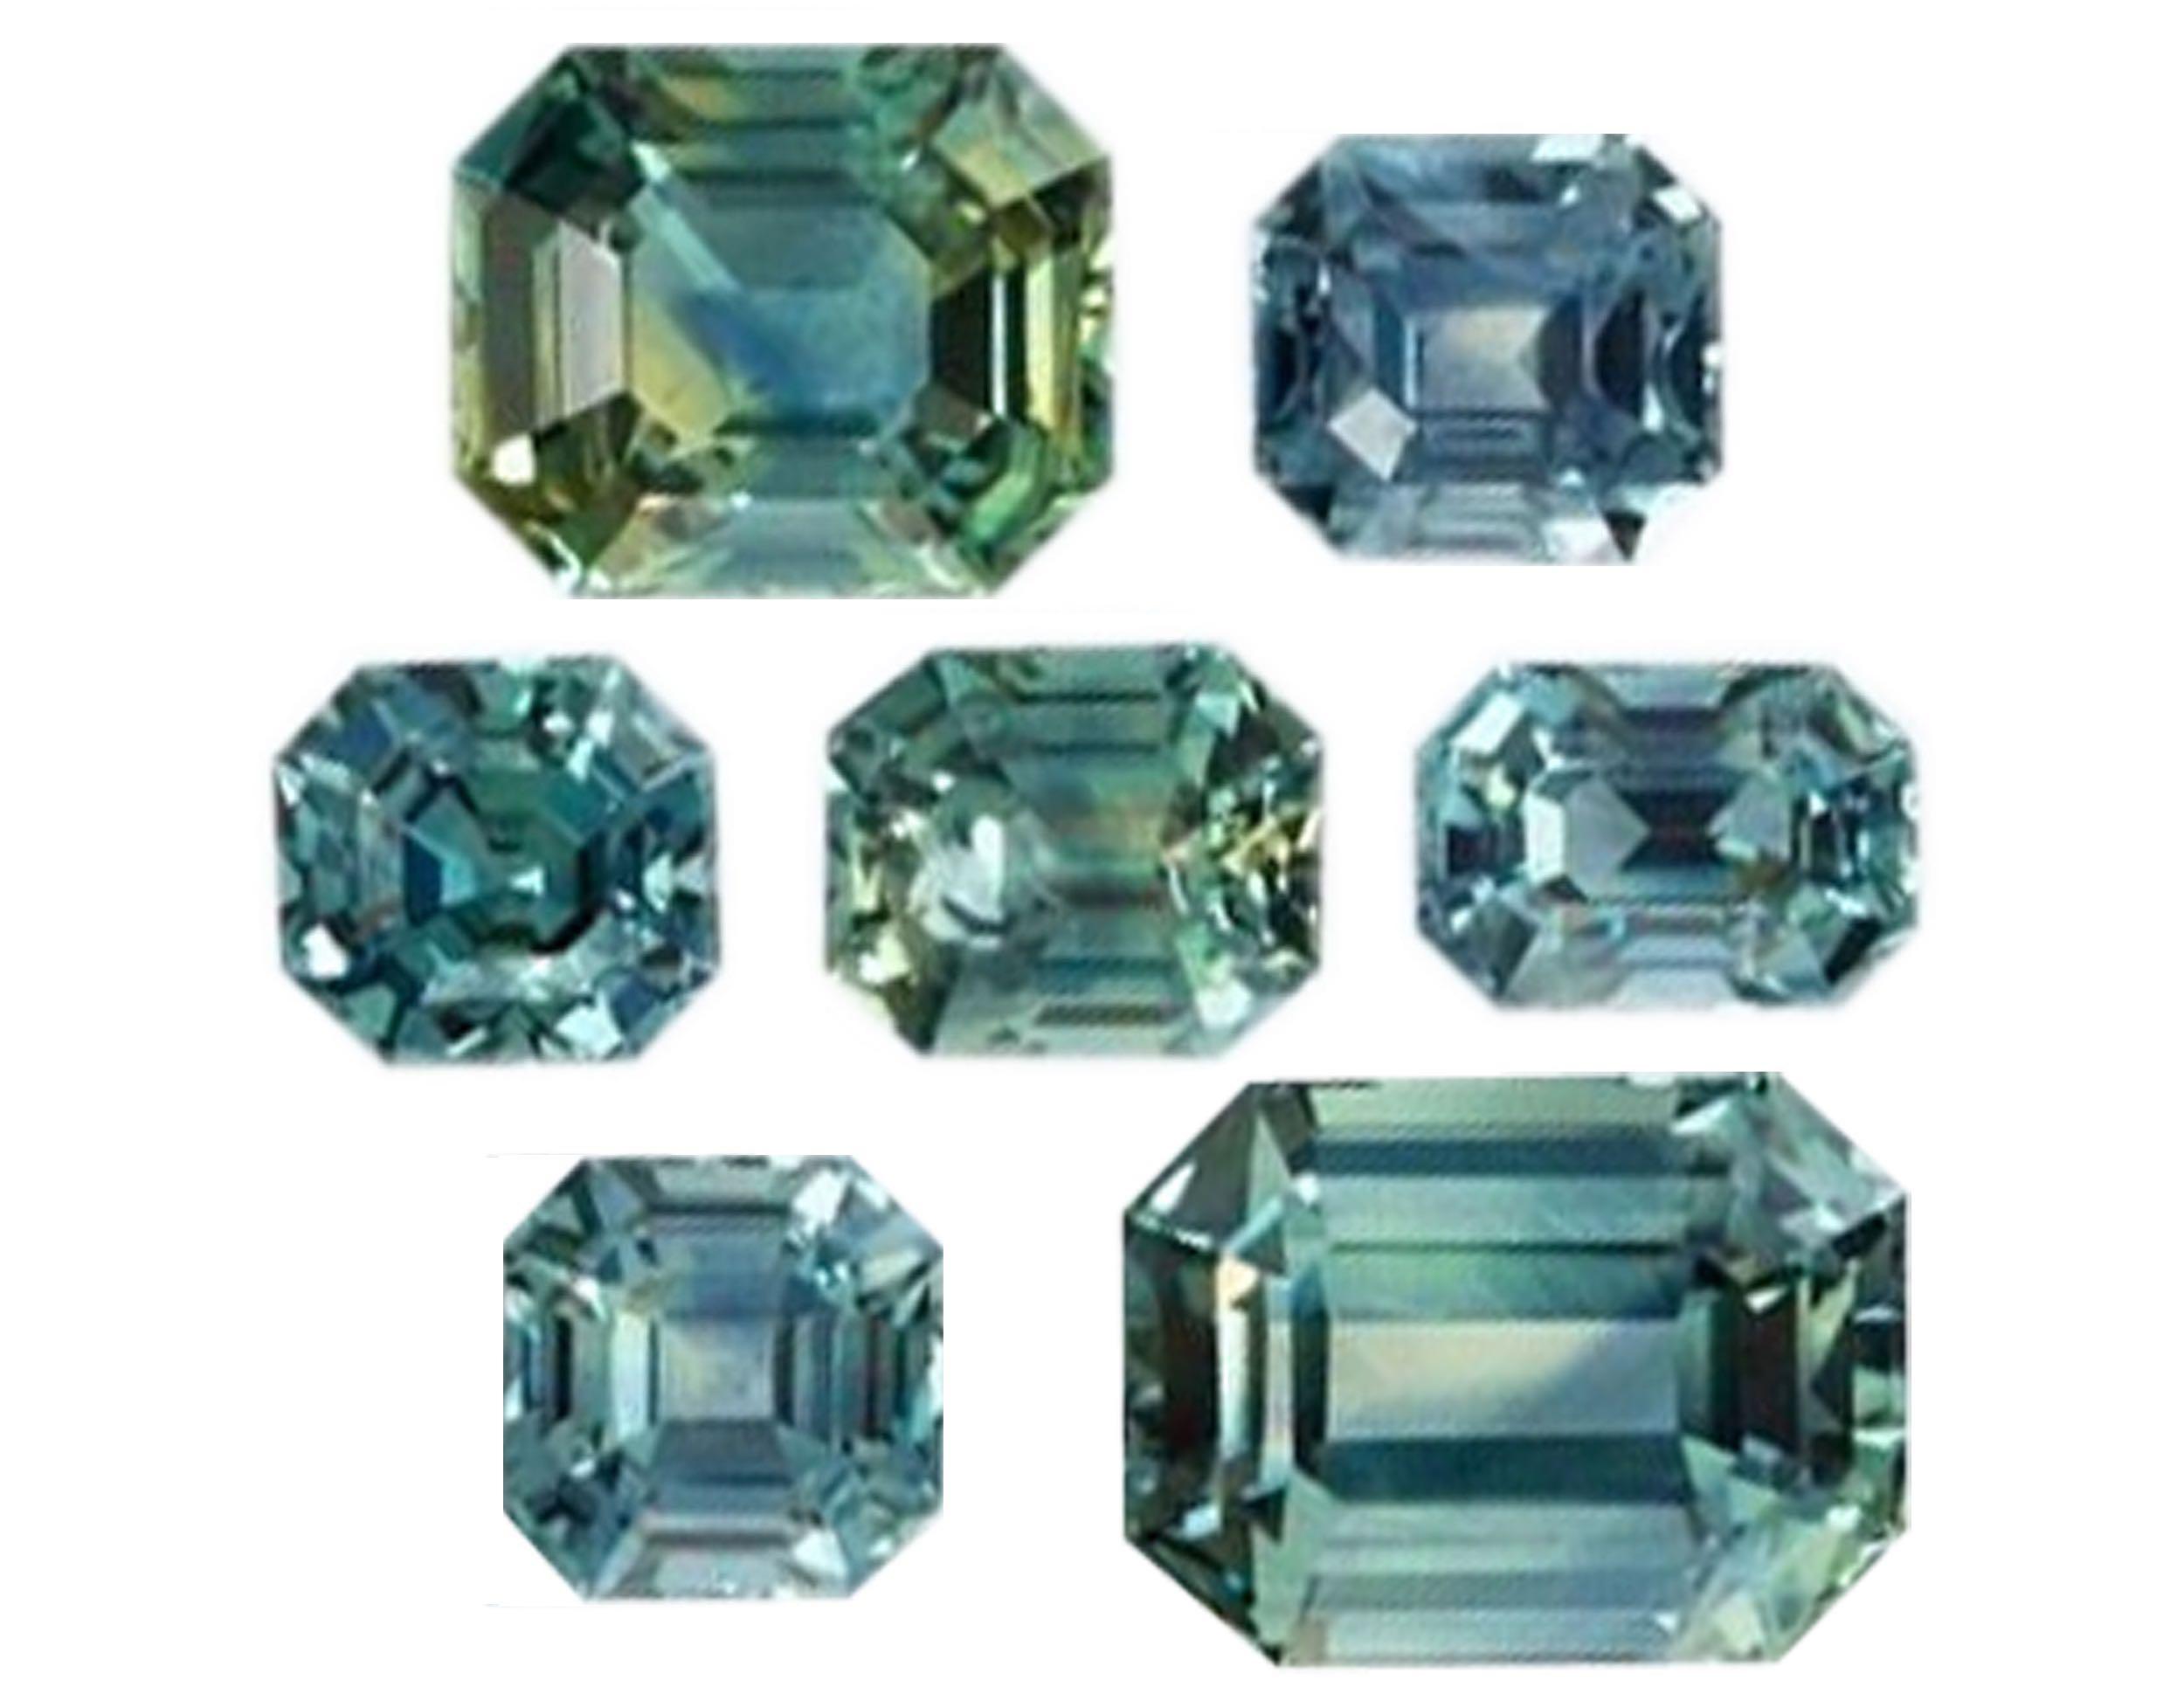 Ethical Metalsmiths - Colored Gemstone.jpg